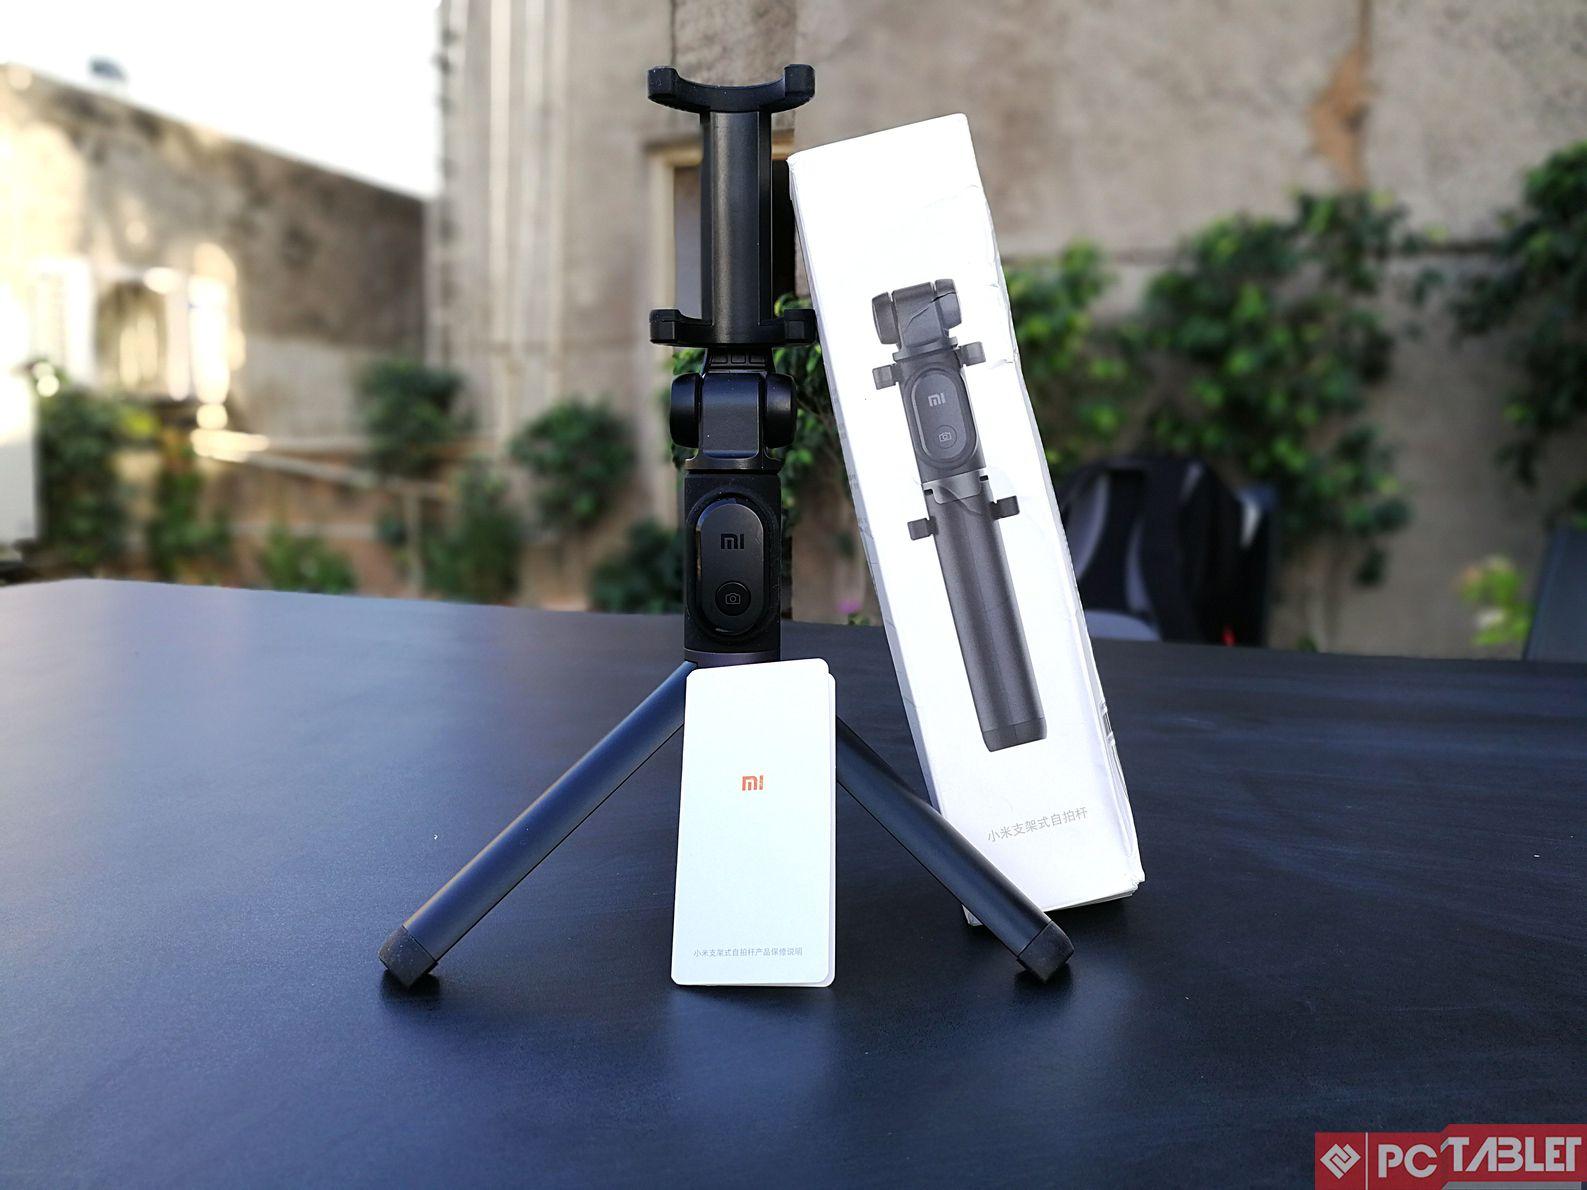 Xiaomi Selfie Stick 7